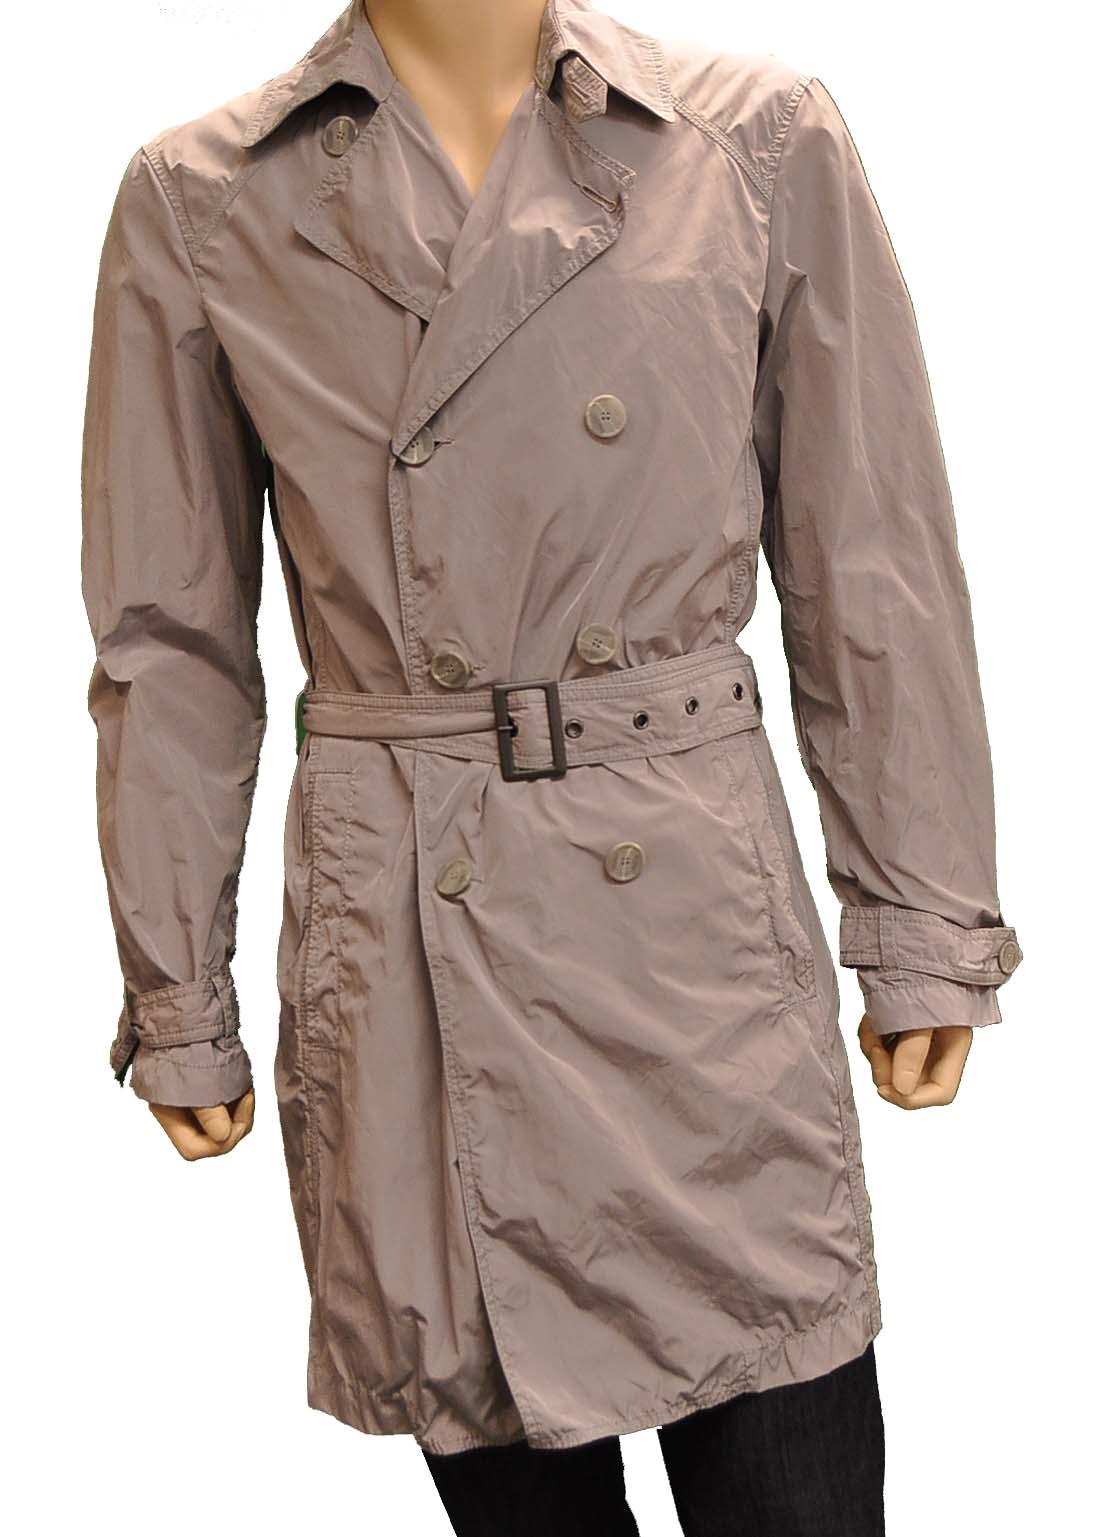 Armani Jeans GRAY Polyester Jacket Coat